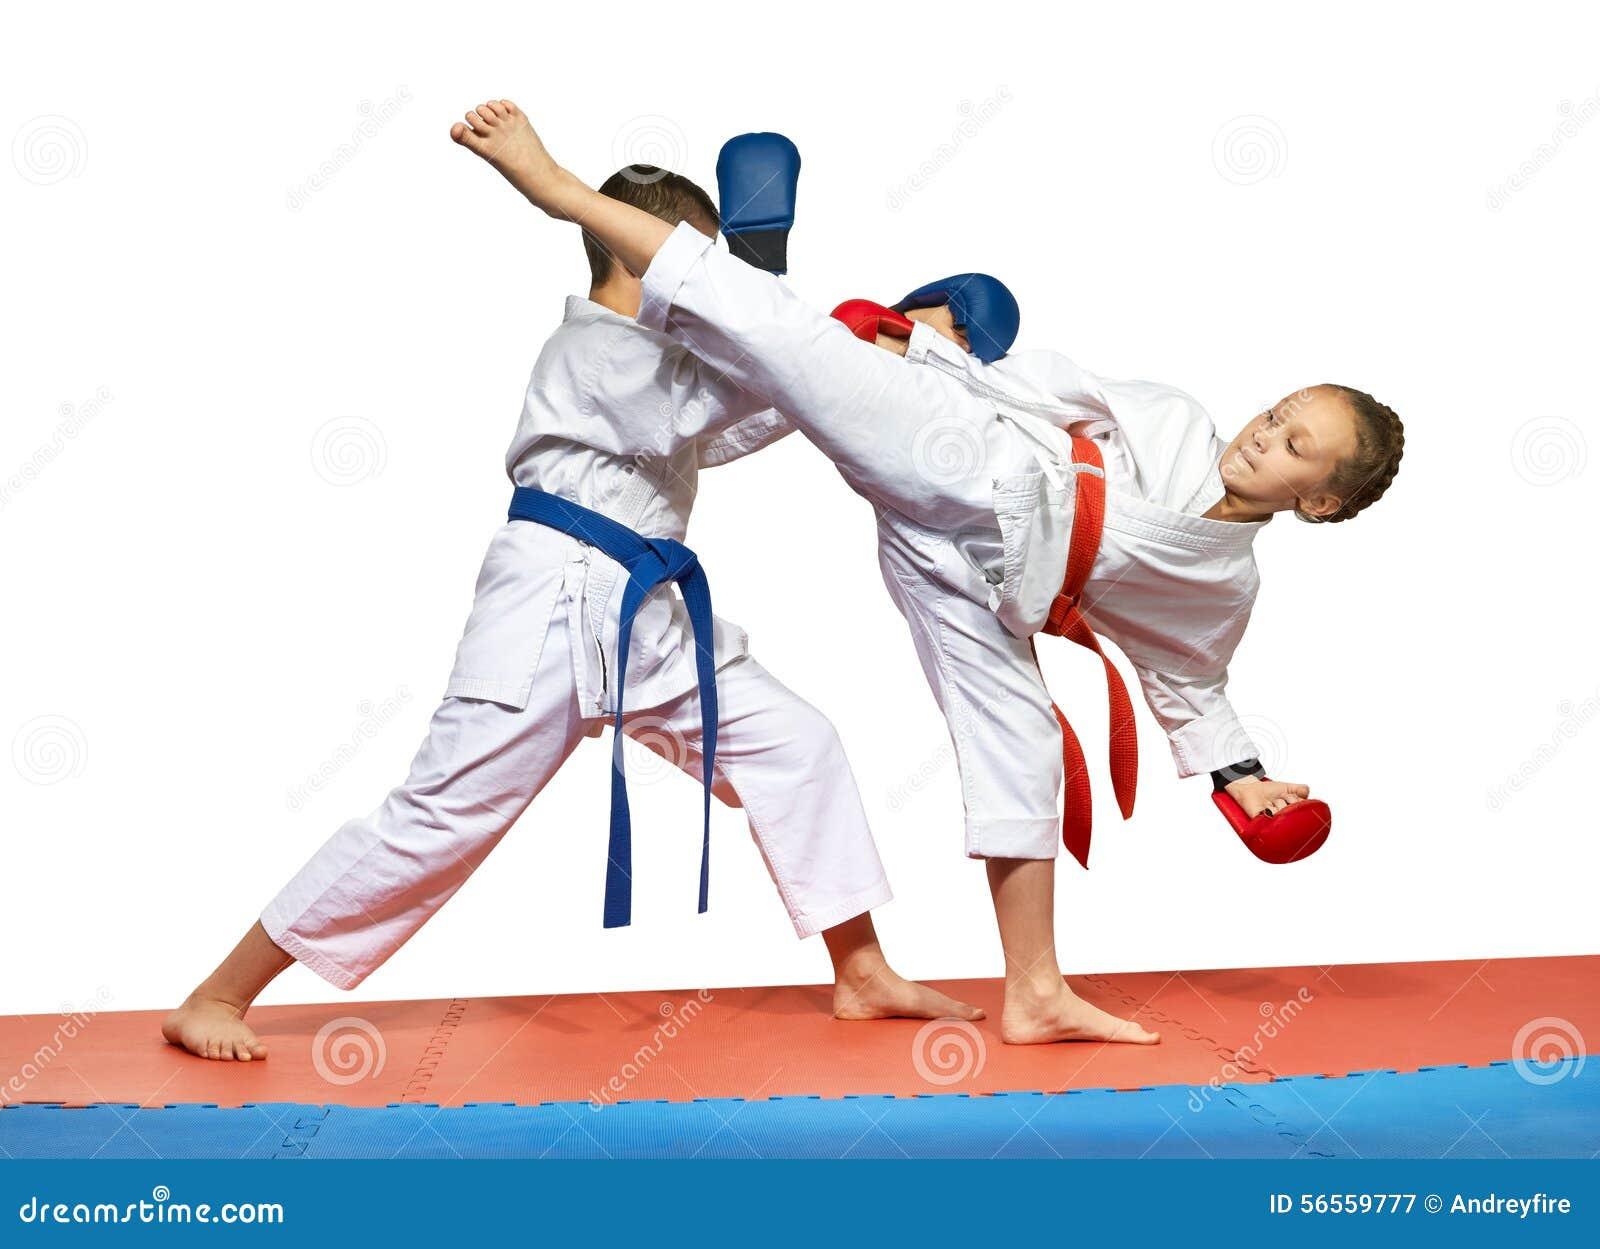 Download Οι αθλητές εκπαιδεύουν κτυπούν το Geri και την προστασία Mavashi Ura ενάντια σε το Στοκ Εικόνα - εικόνα από επιτυχία, ευτυχία: 56559777